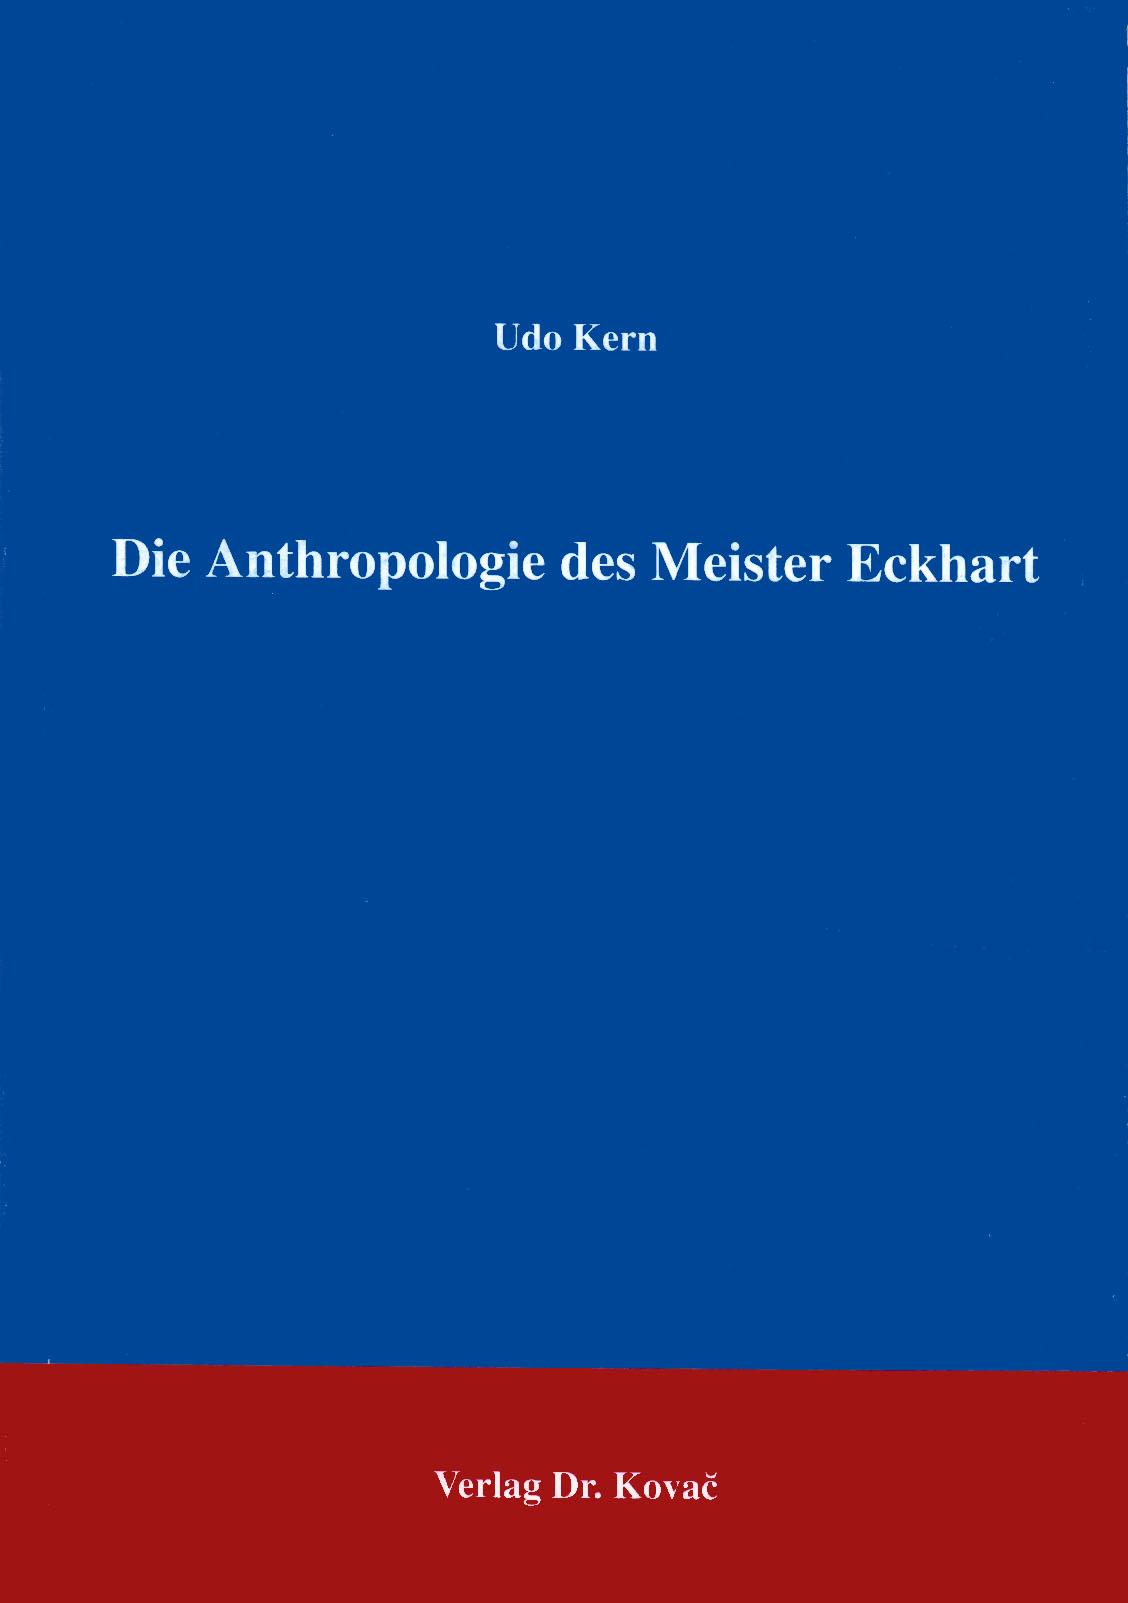 Cover: Die Anthropologie des Meister Eckhart